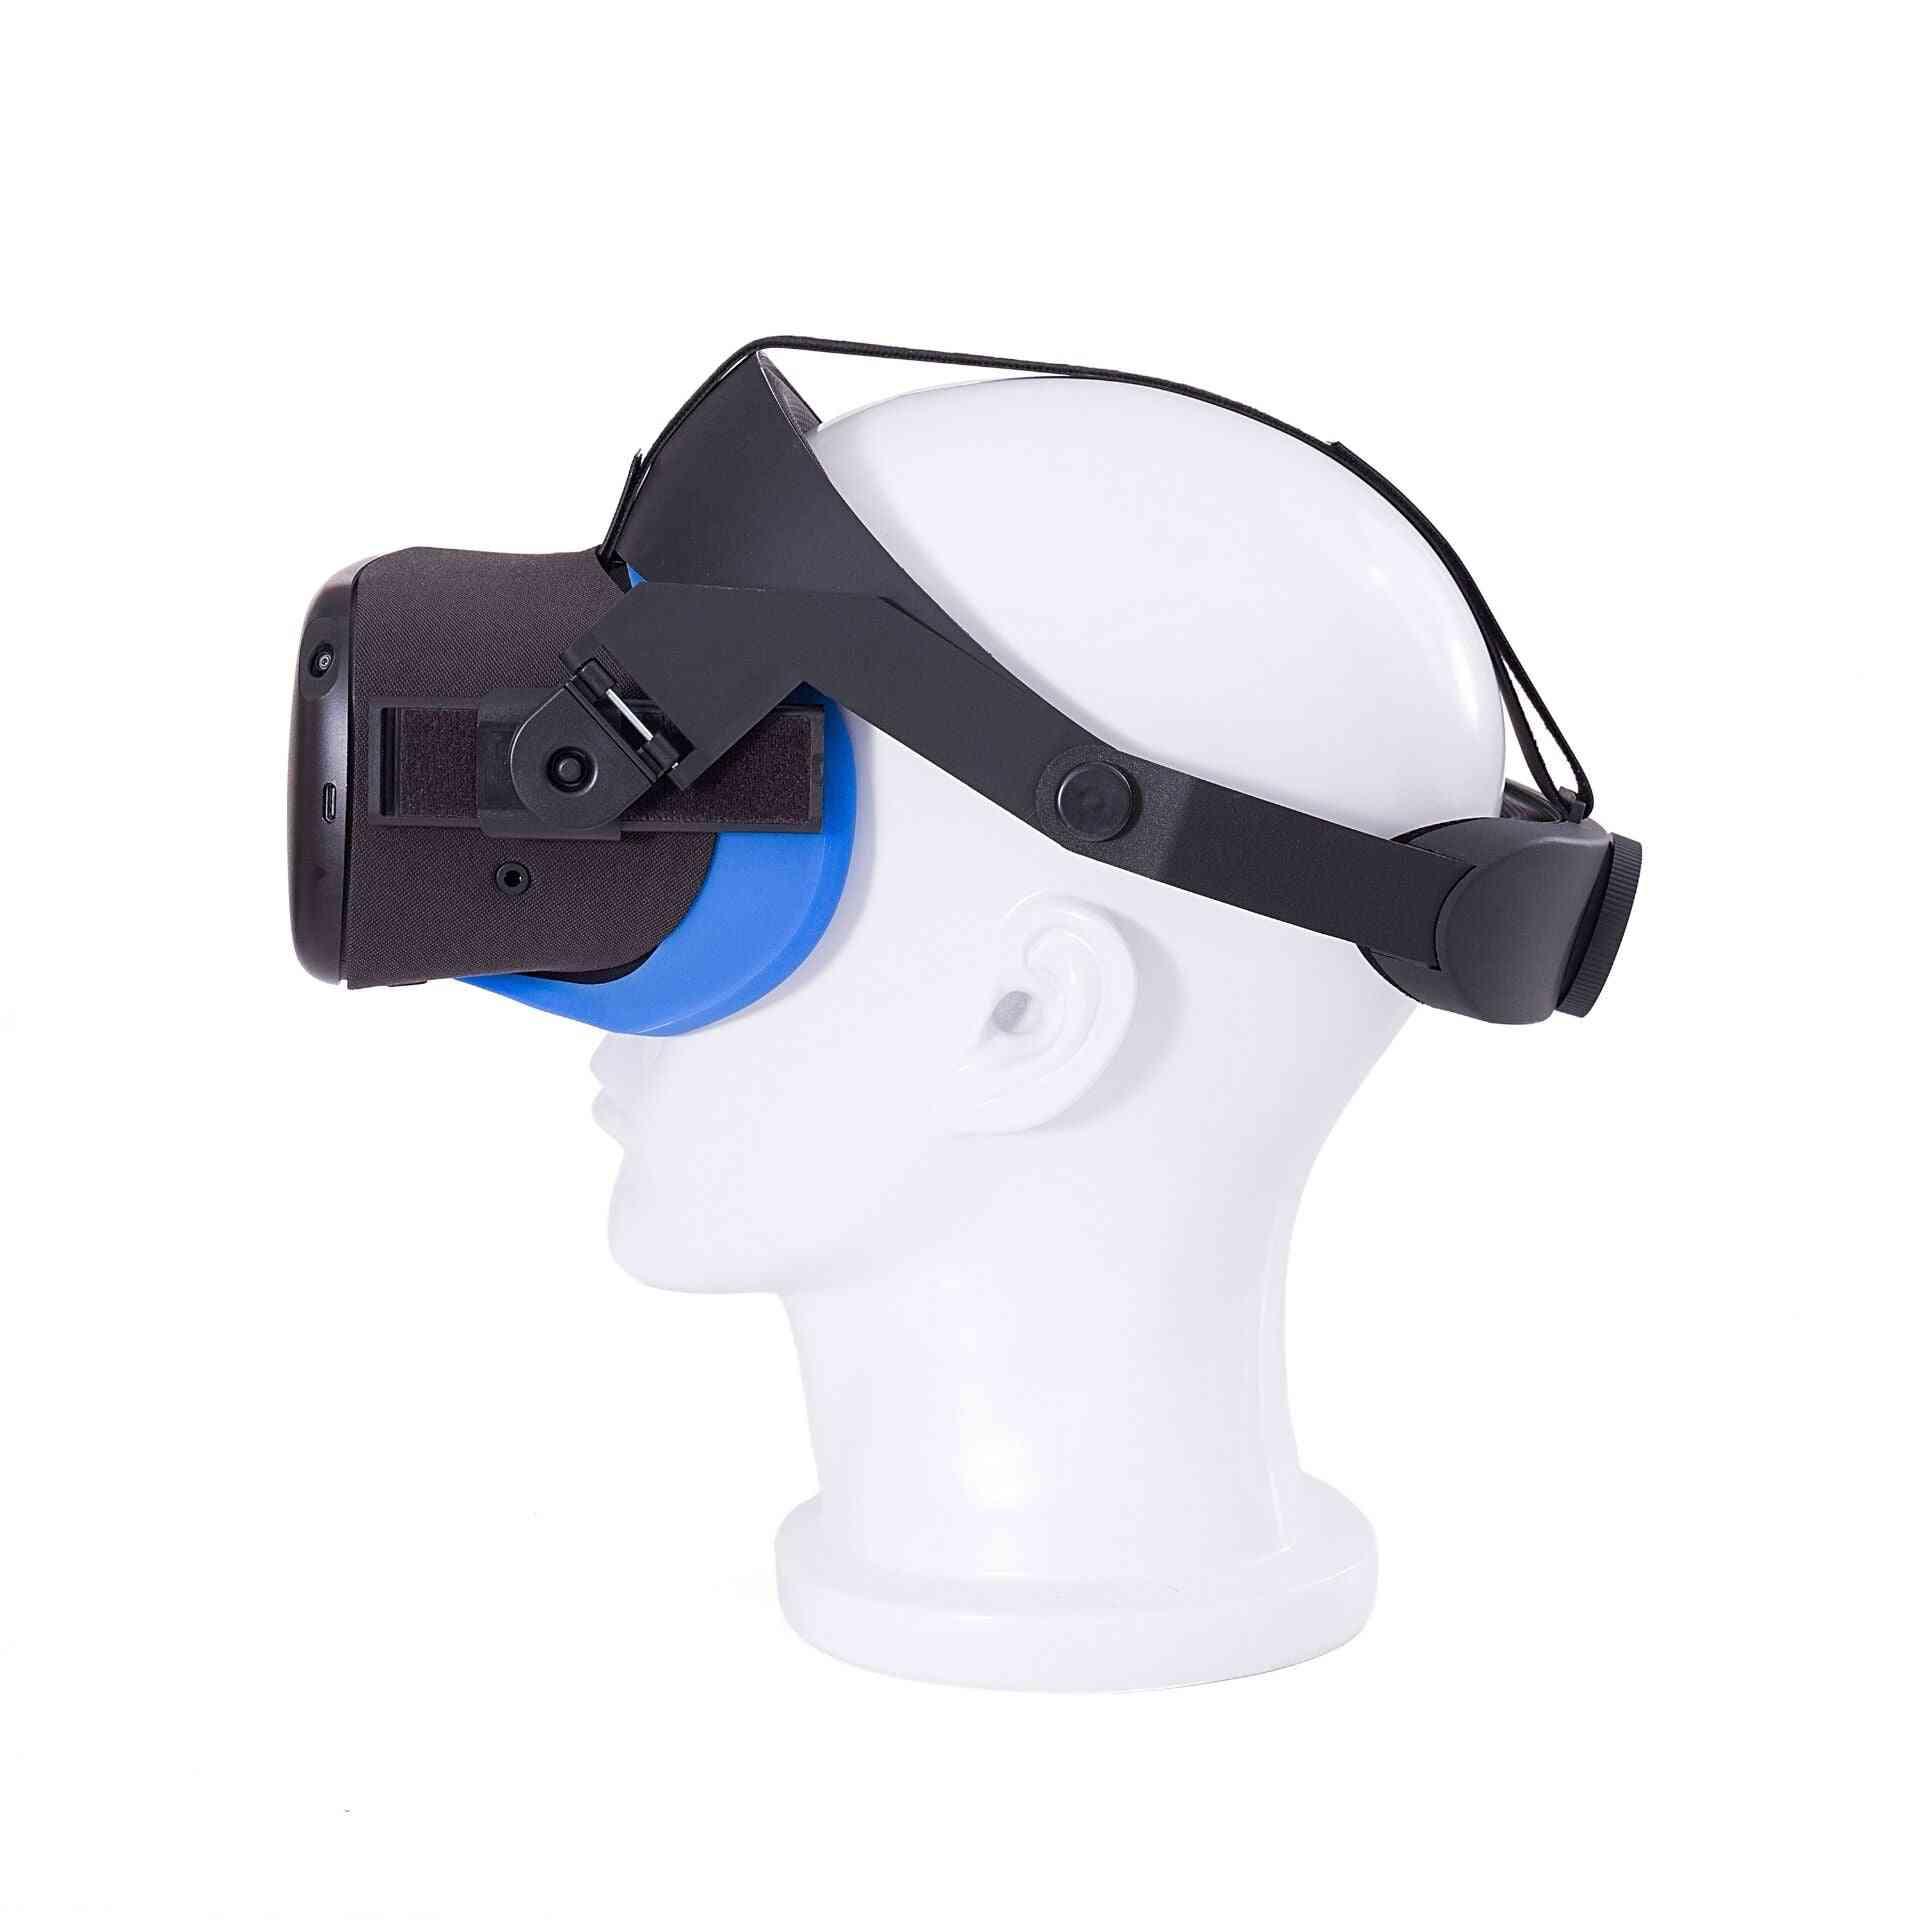 Halo Strap-comfortable And Adjustable, Virtual Reality Headwear